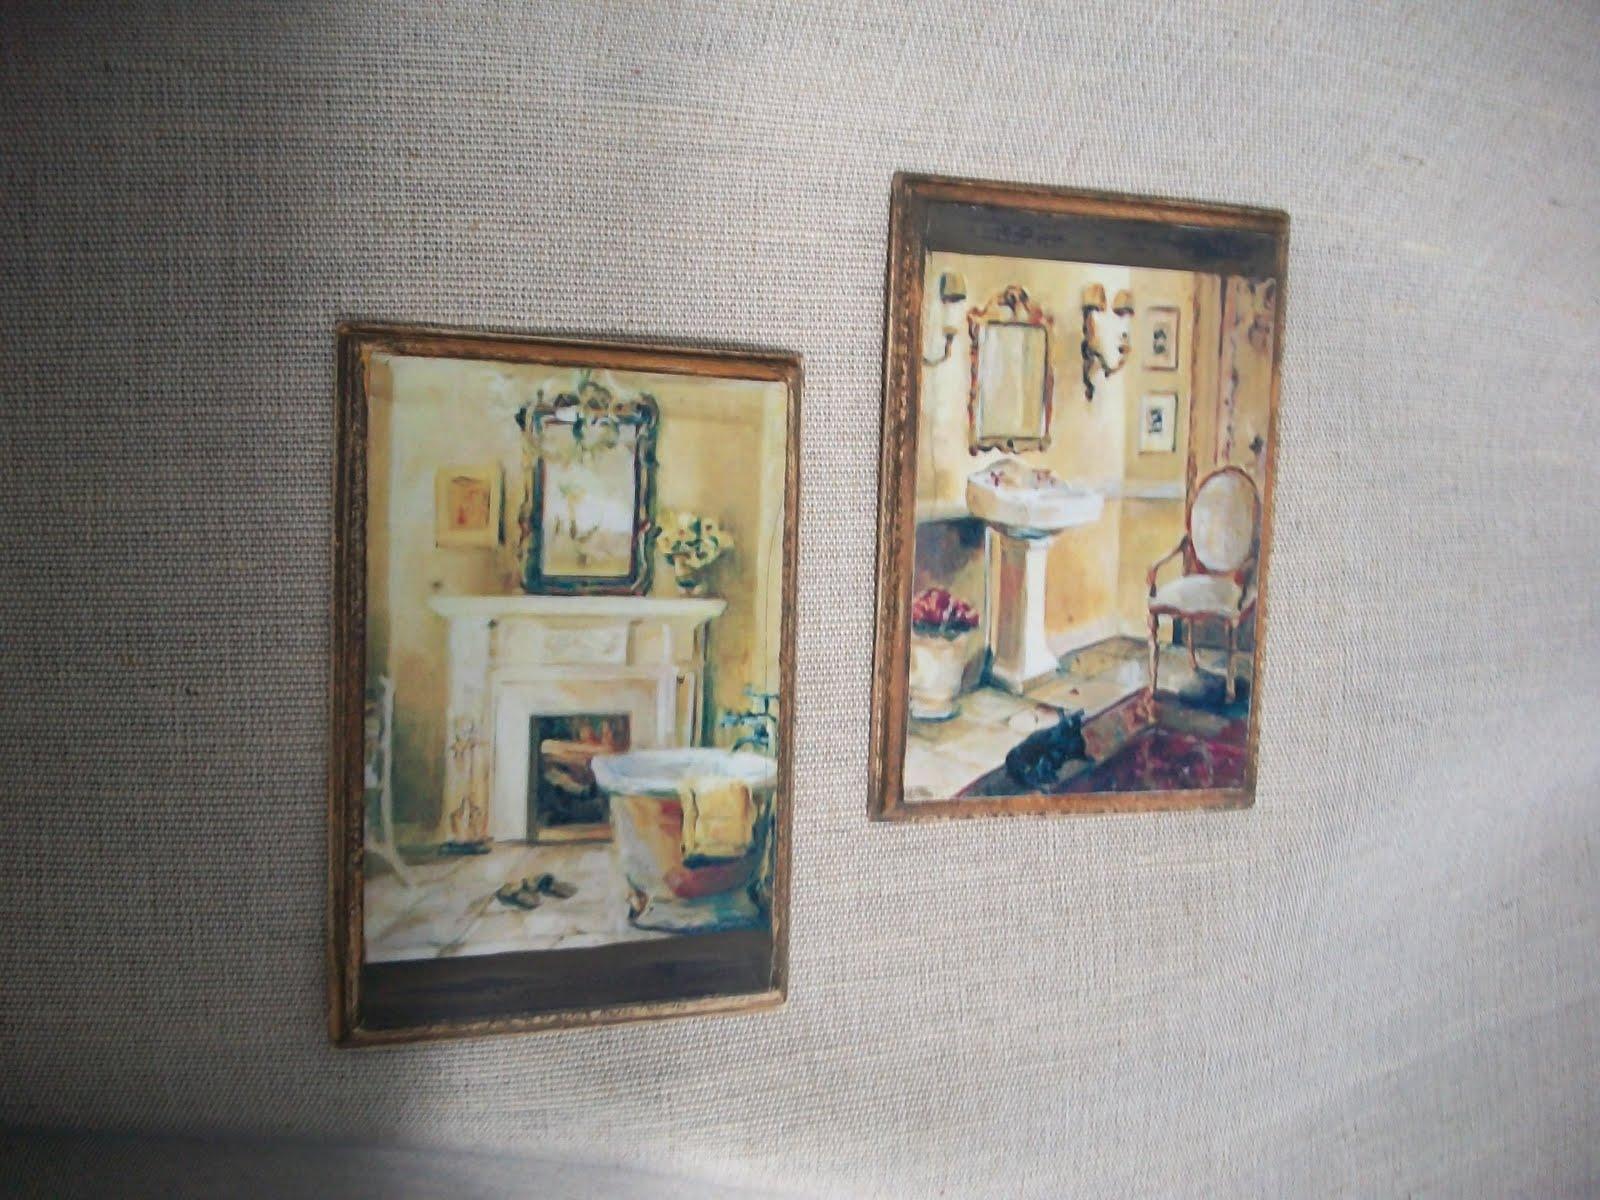 Liz peque os cuadros para ba os y vestidor - Cuadros para banos pequenos ...